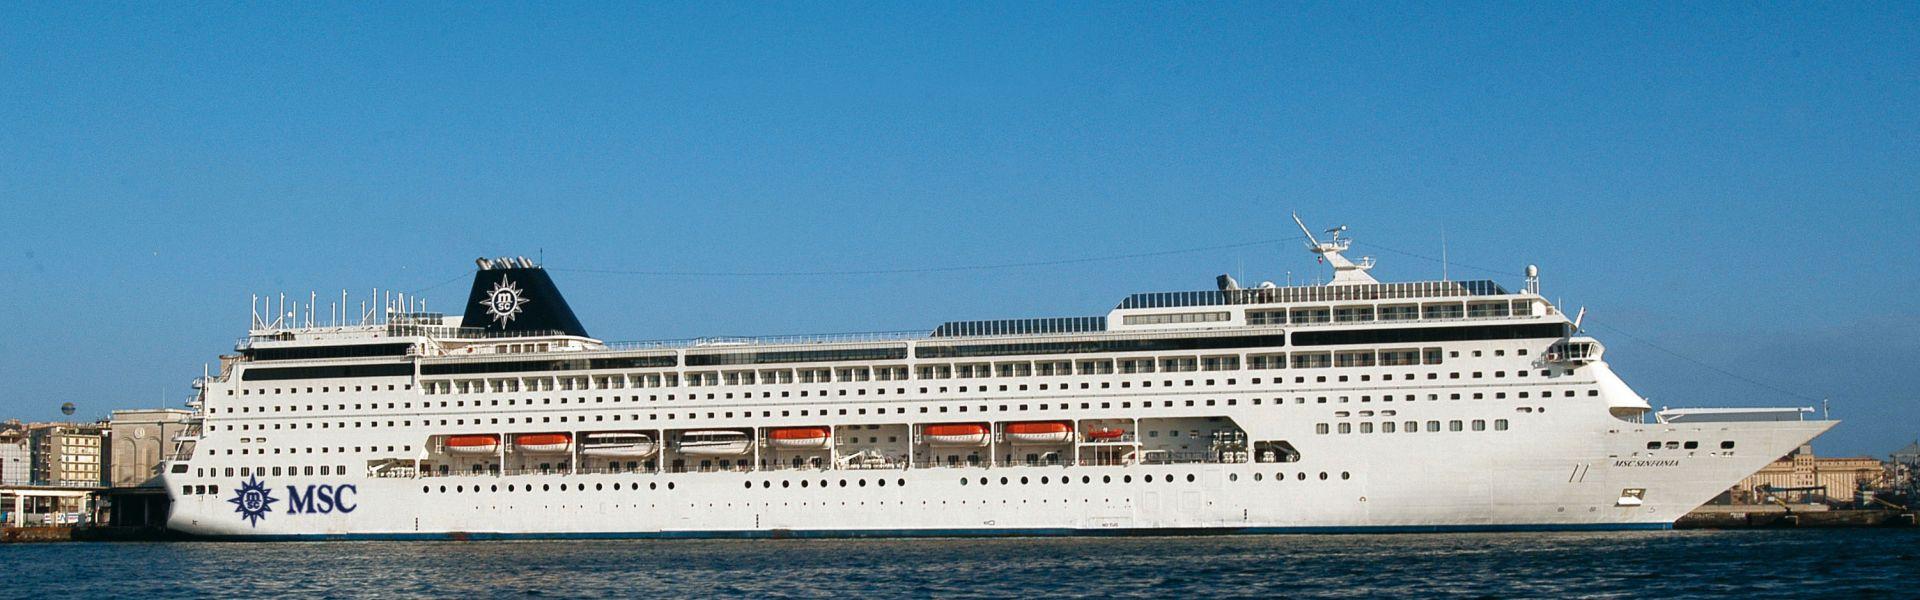 Croaziera 2019 - Mediterana de Vest (Civitavecchia) - MSC Cruises - MSC Sinfonia - 10 nopti